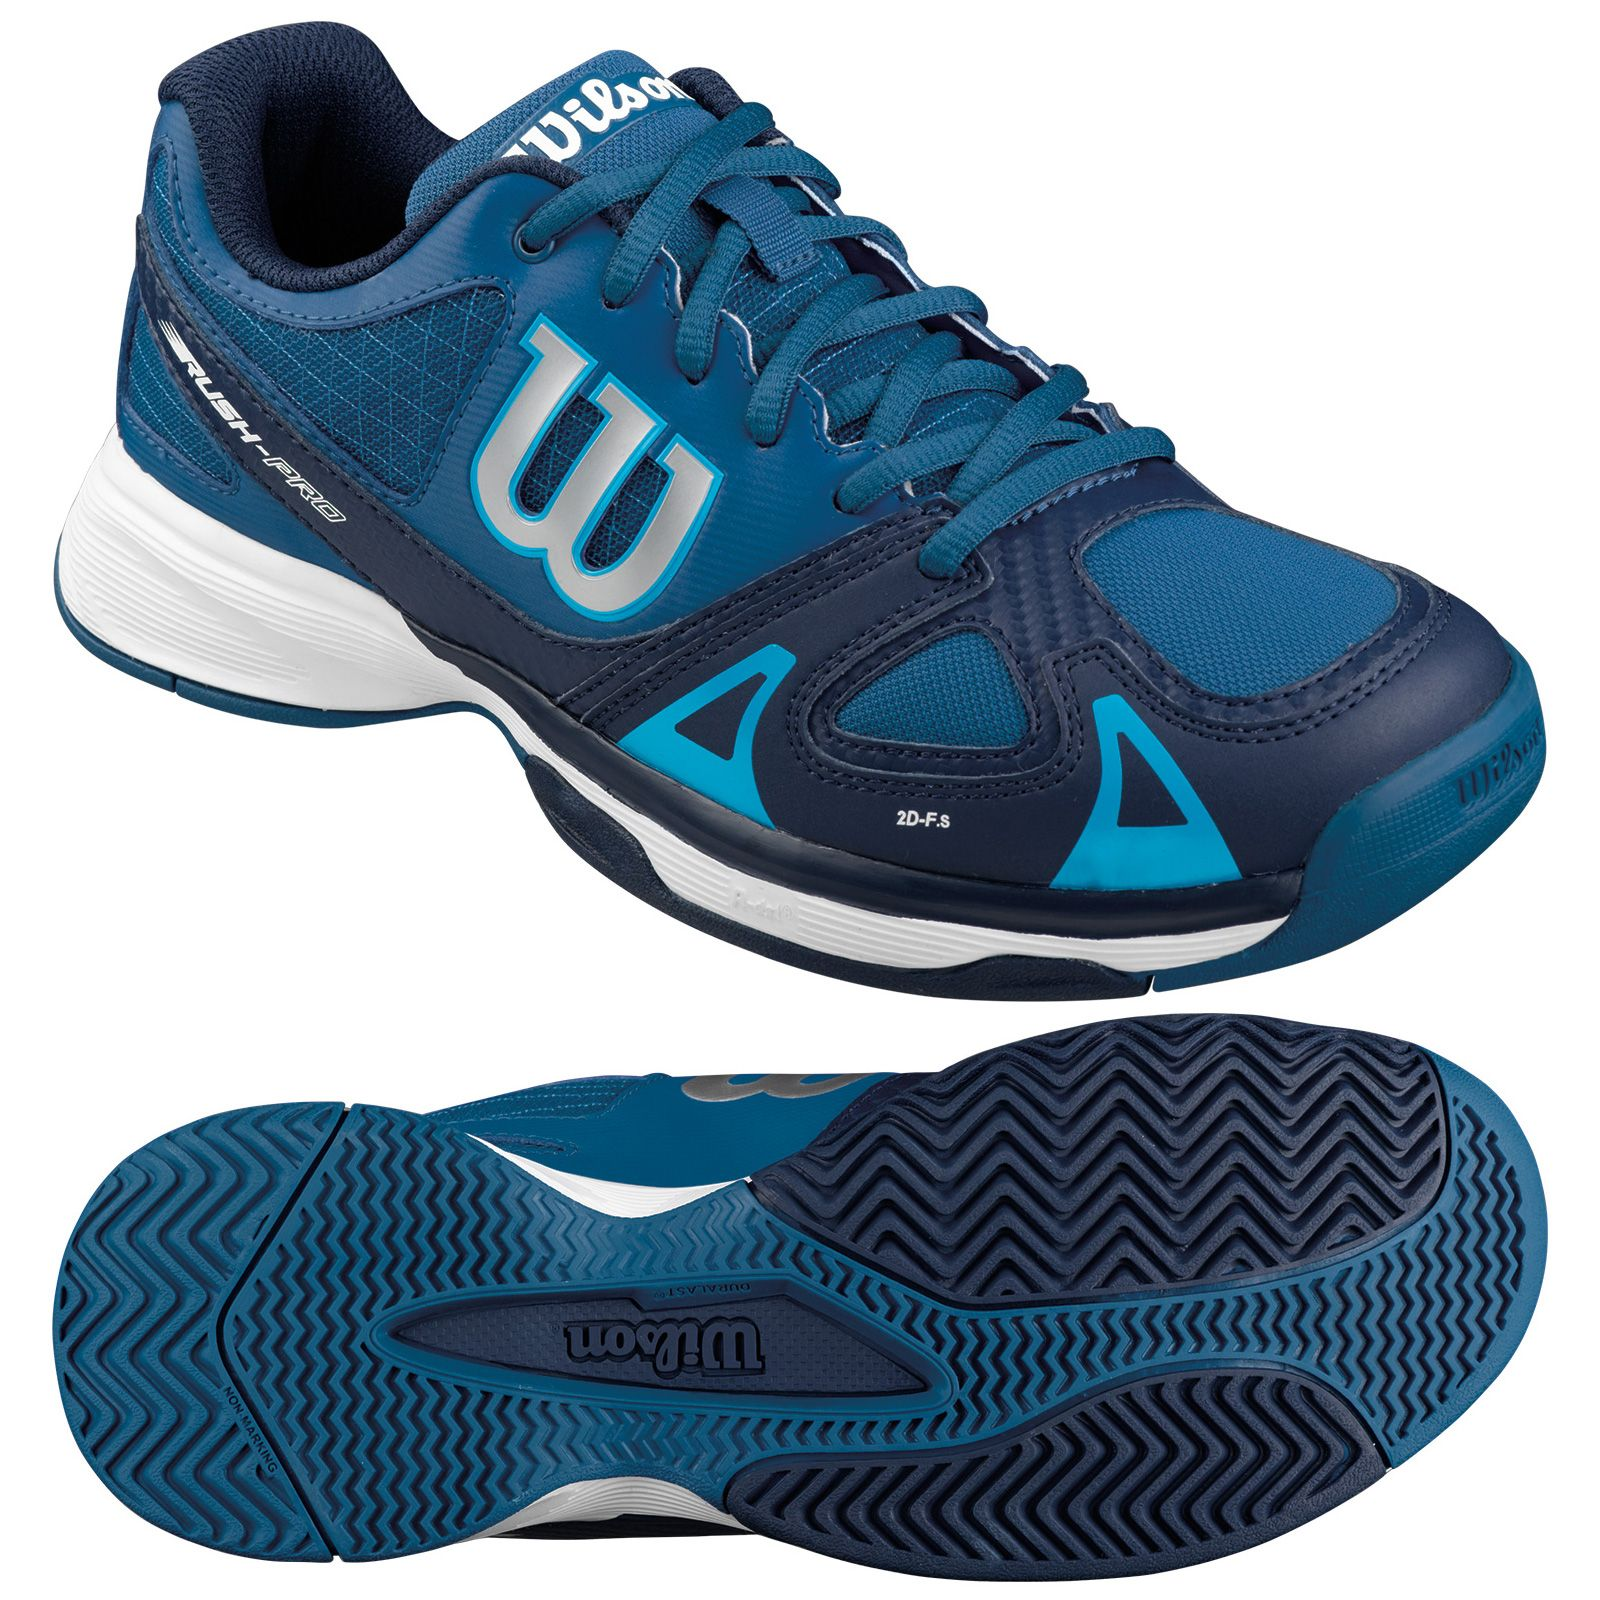 wilson pro junior tennis shoes